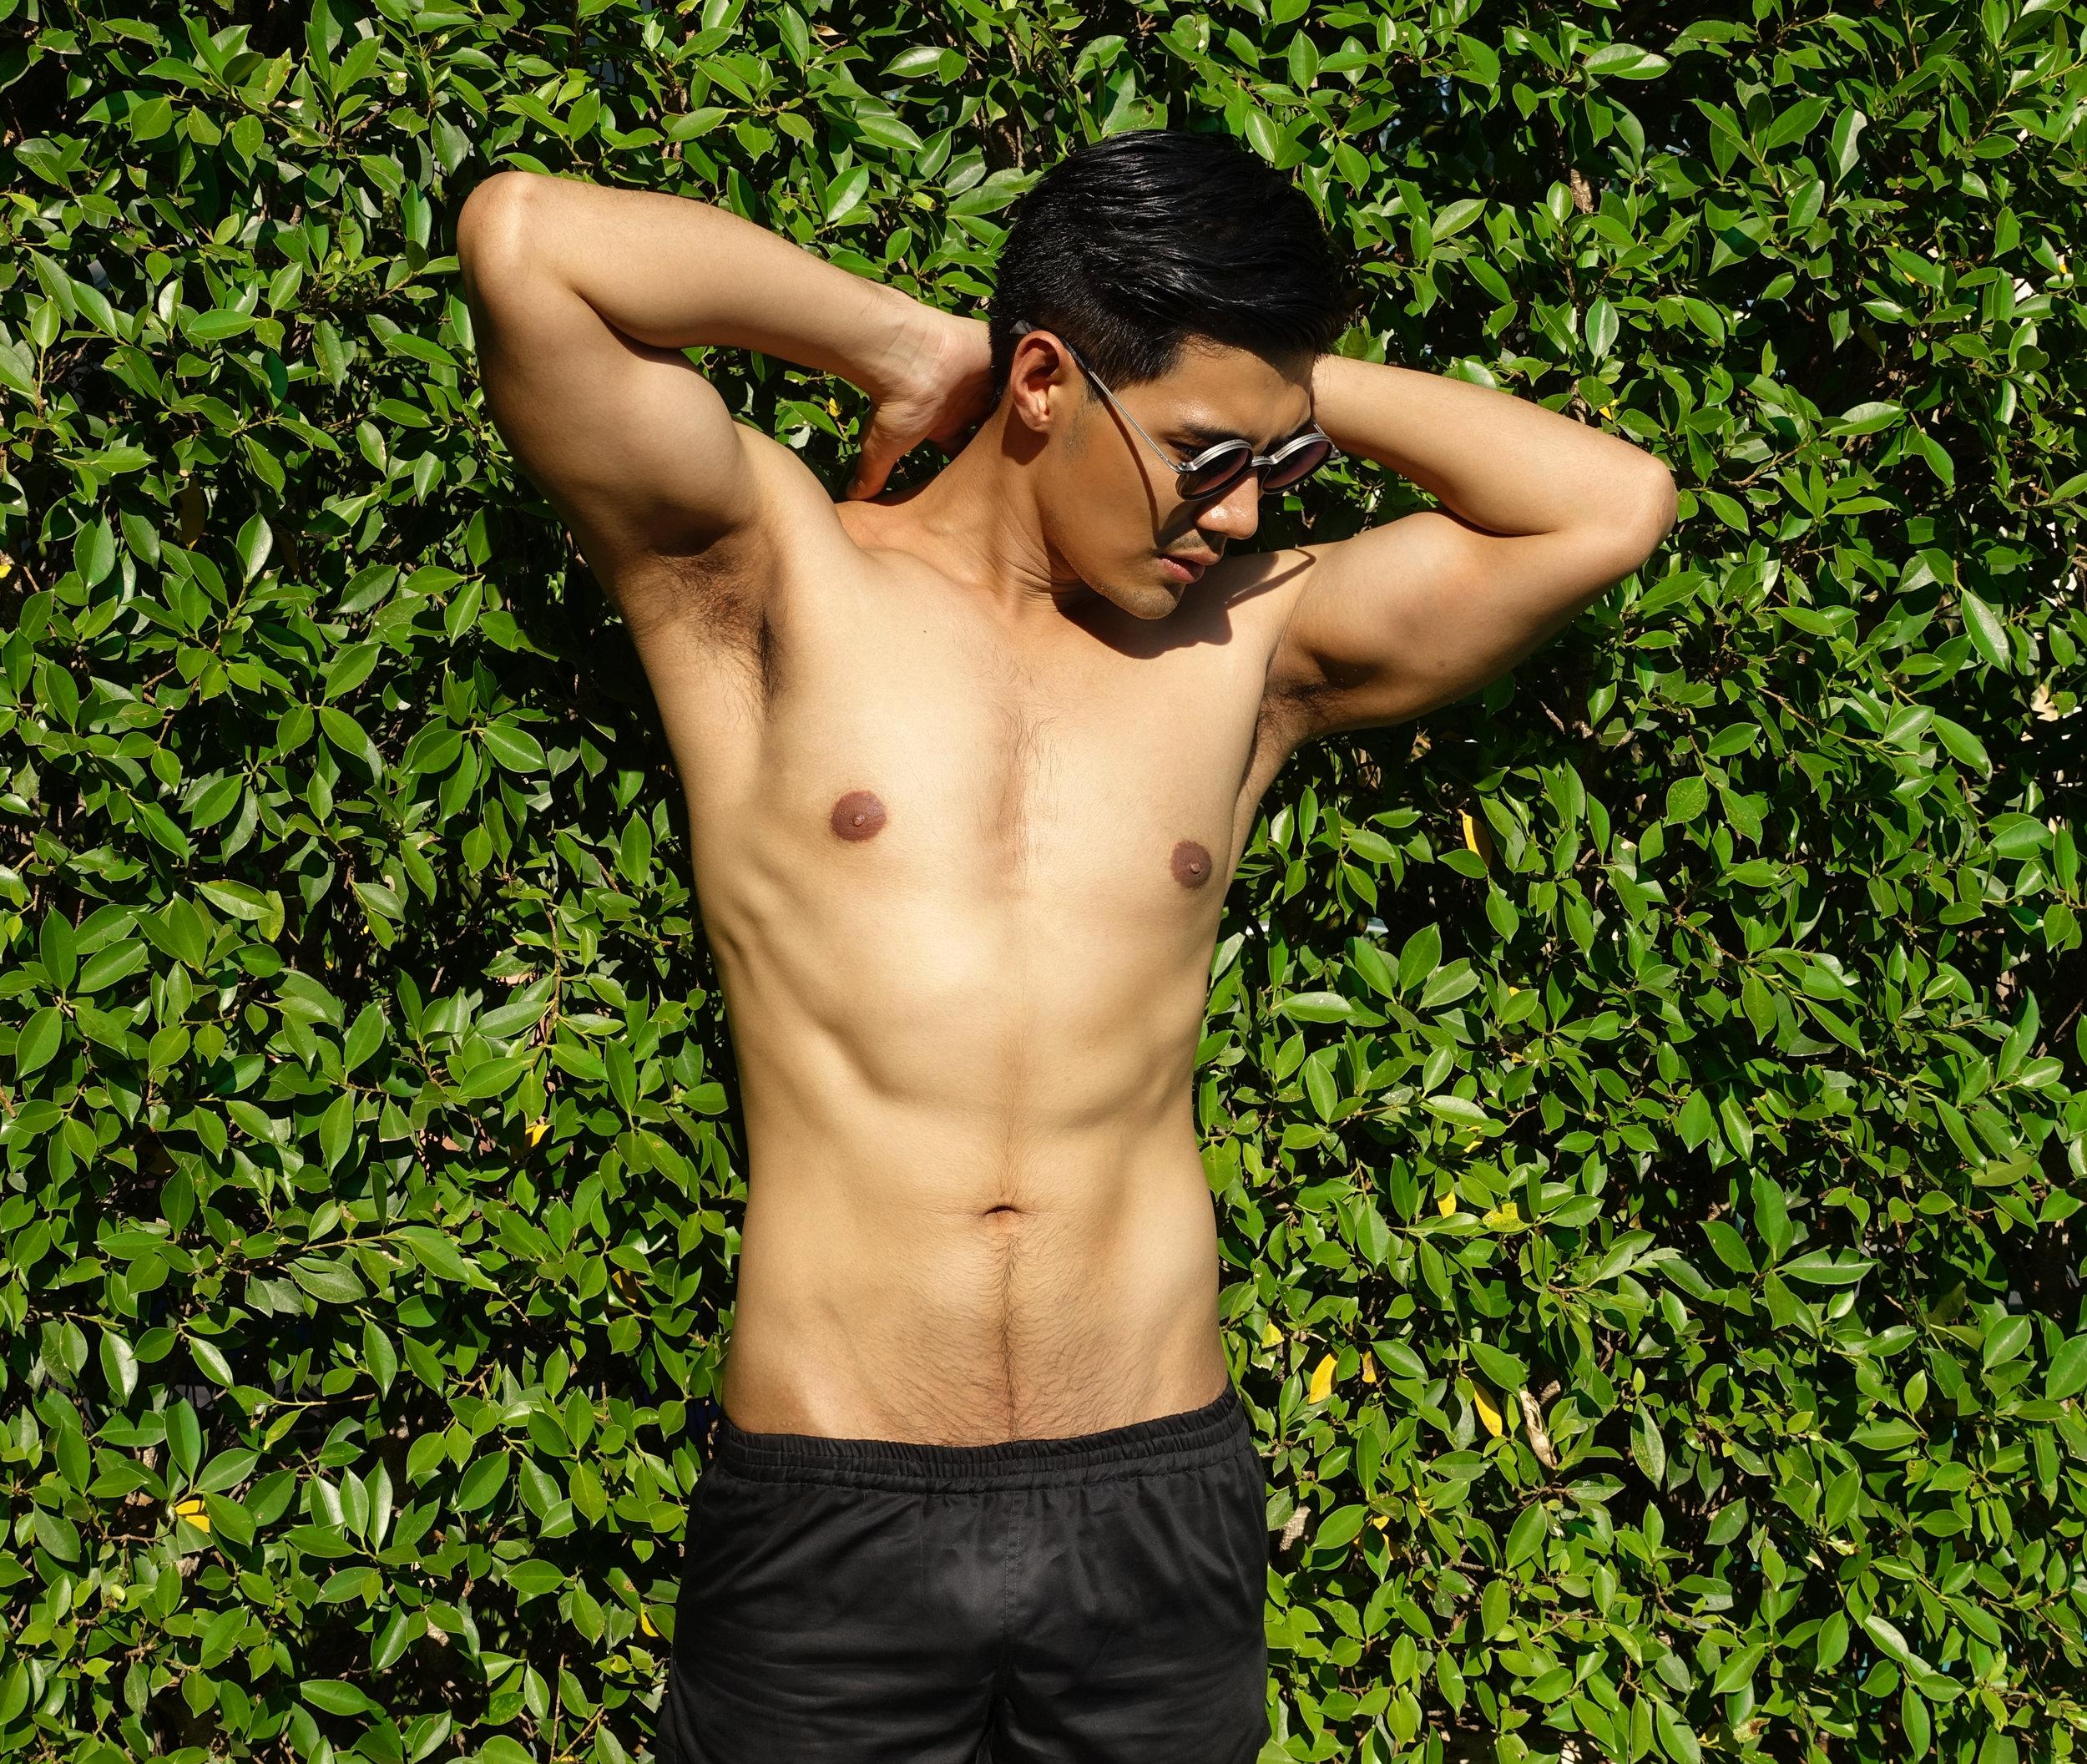 sunglasses : TAVAT / shorts : SARIT